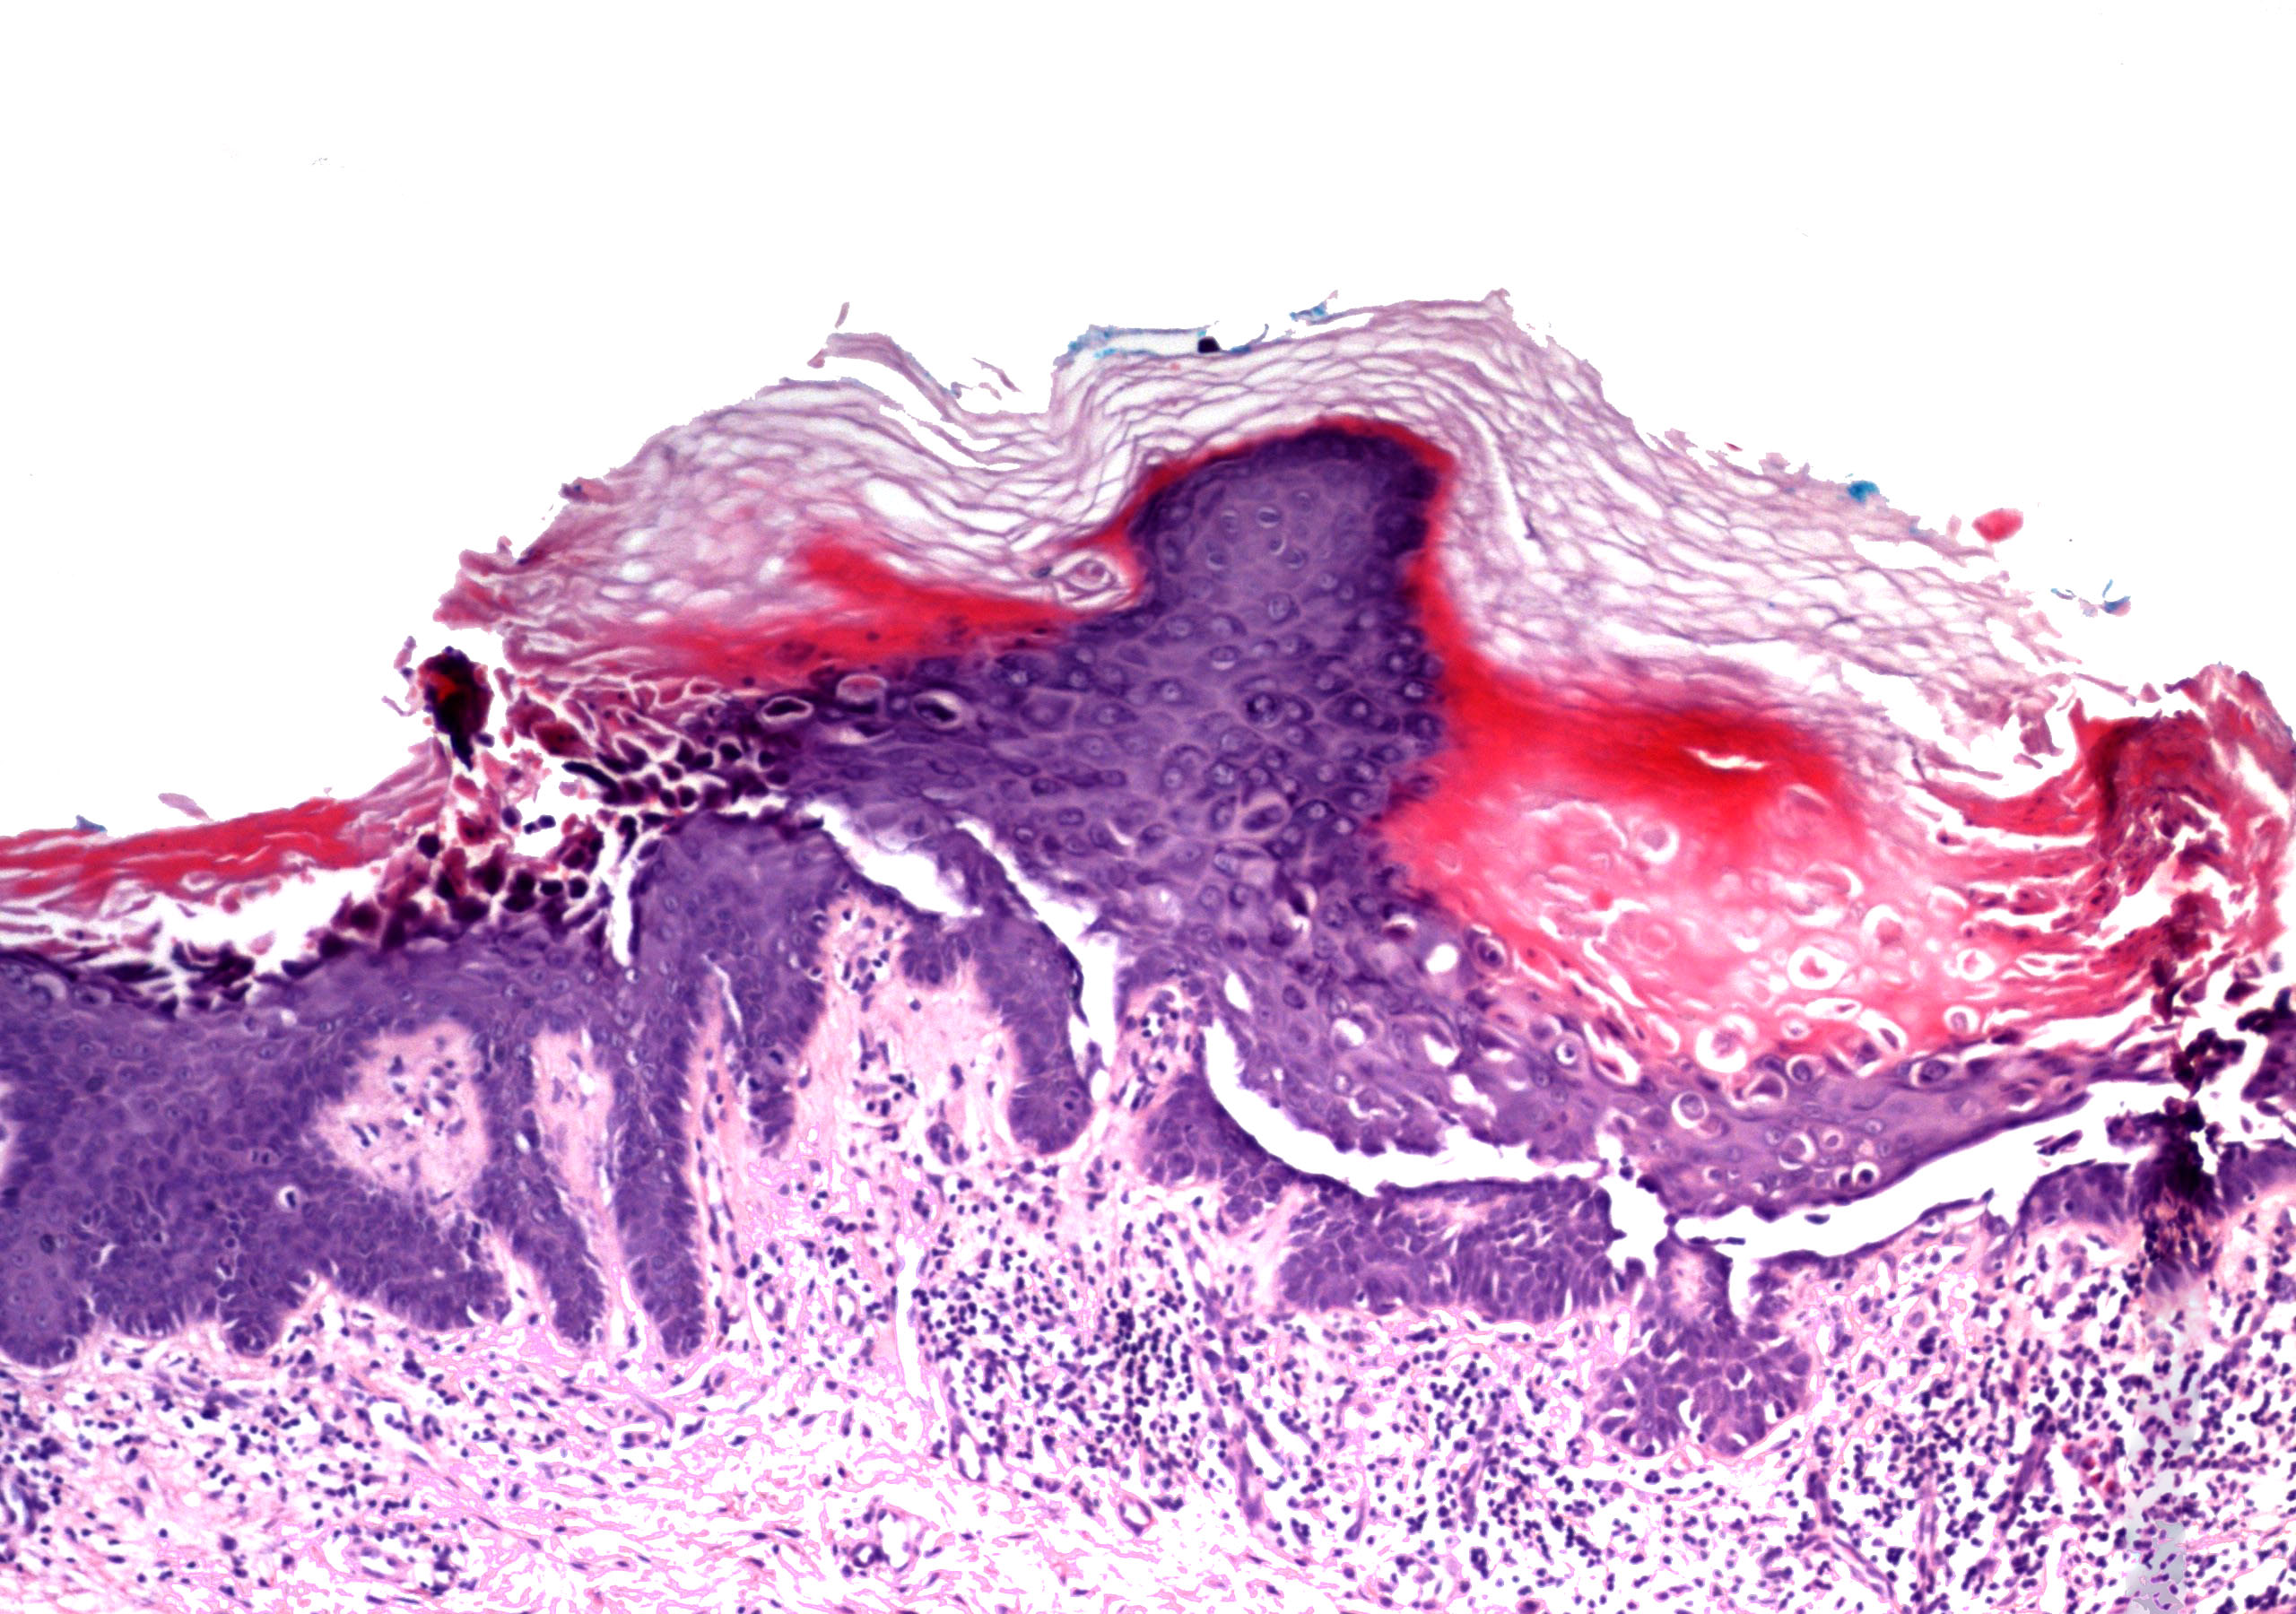 Hyperkeratosis and<br>intraepidermal<br>clefting